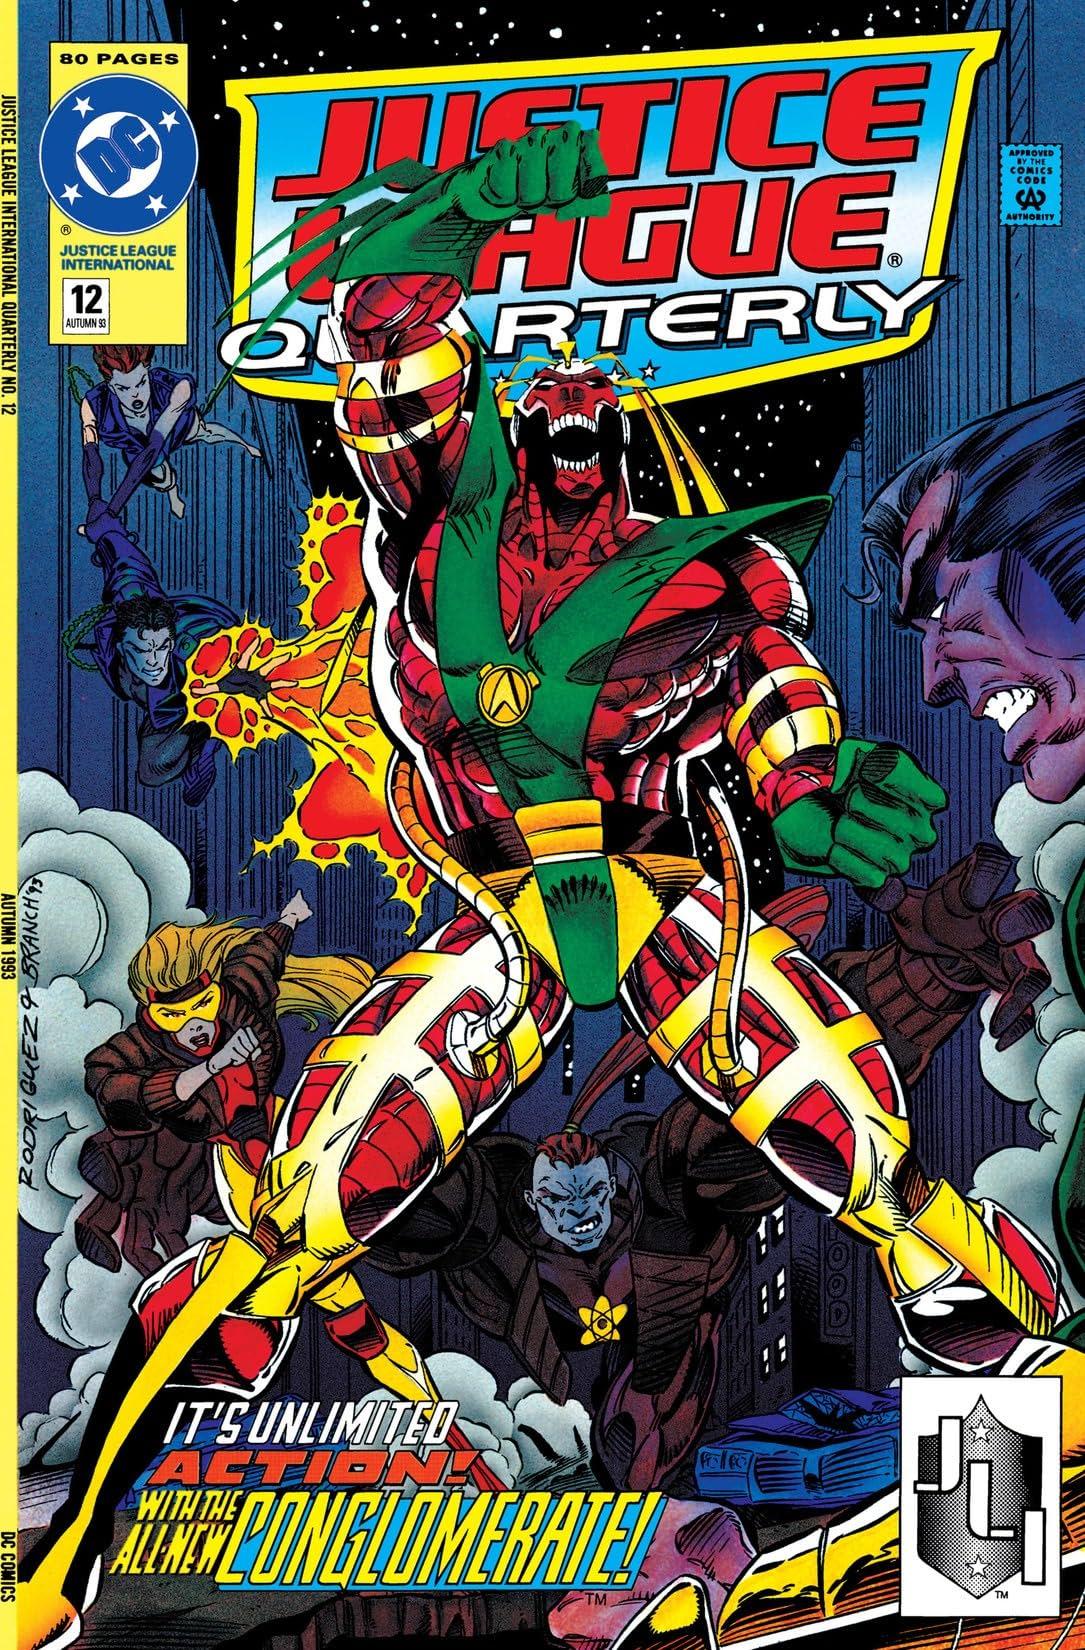 Justice League Quarterly (1990-1994) #12